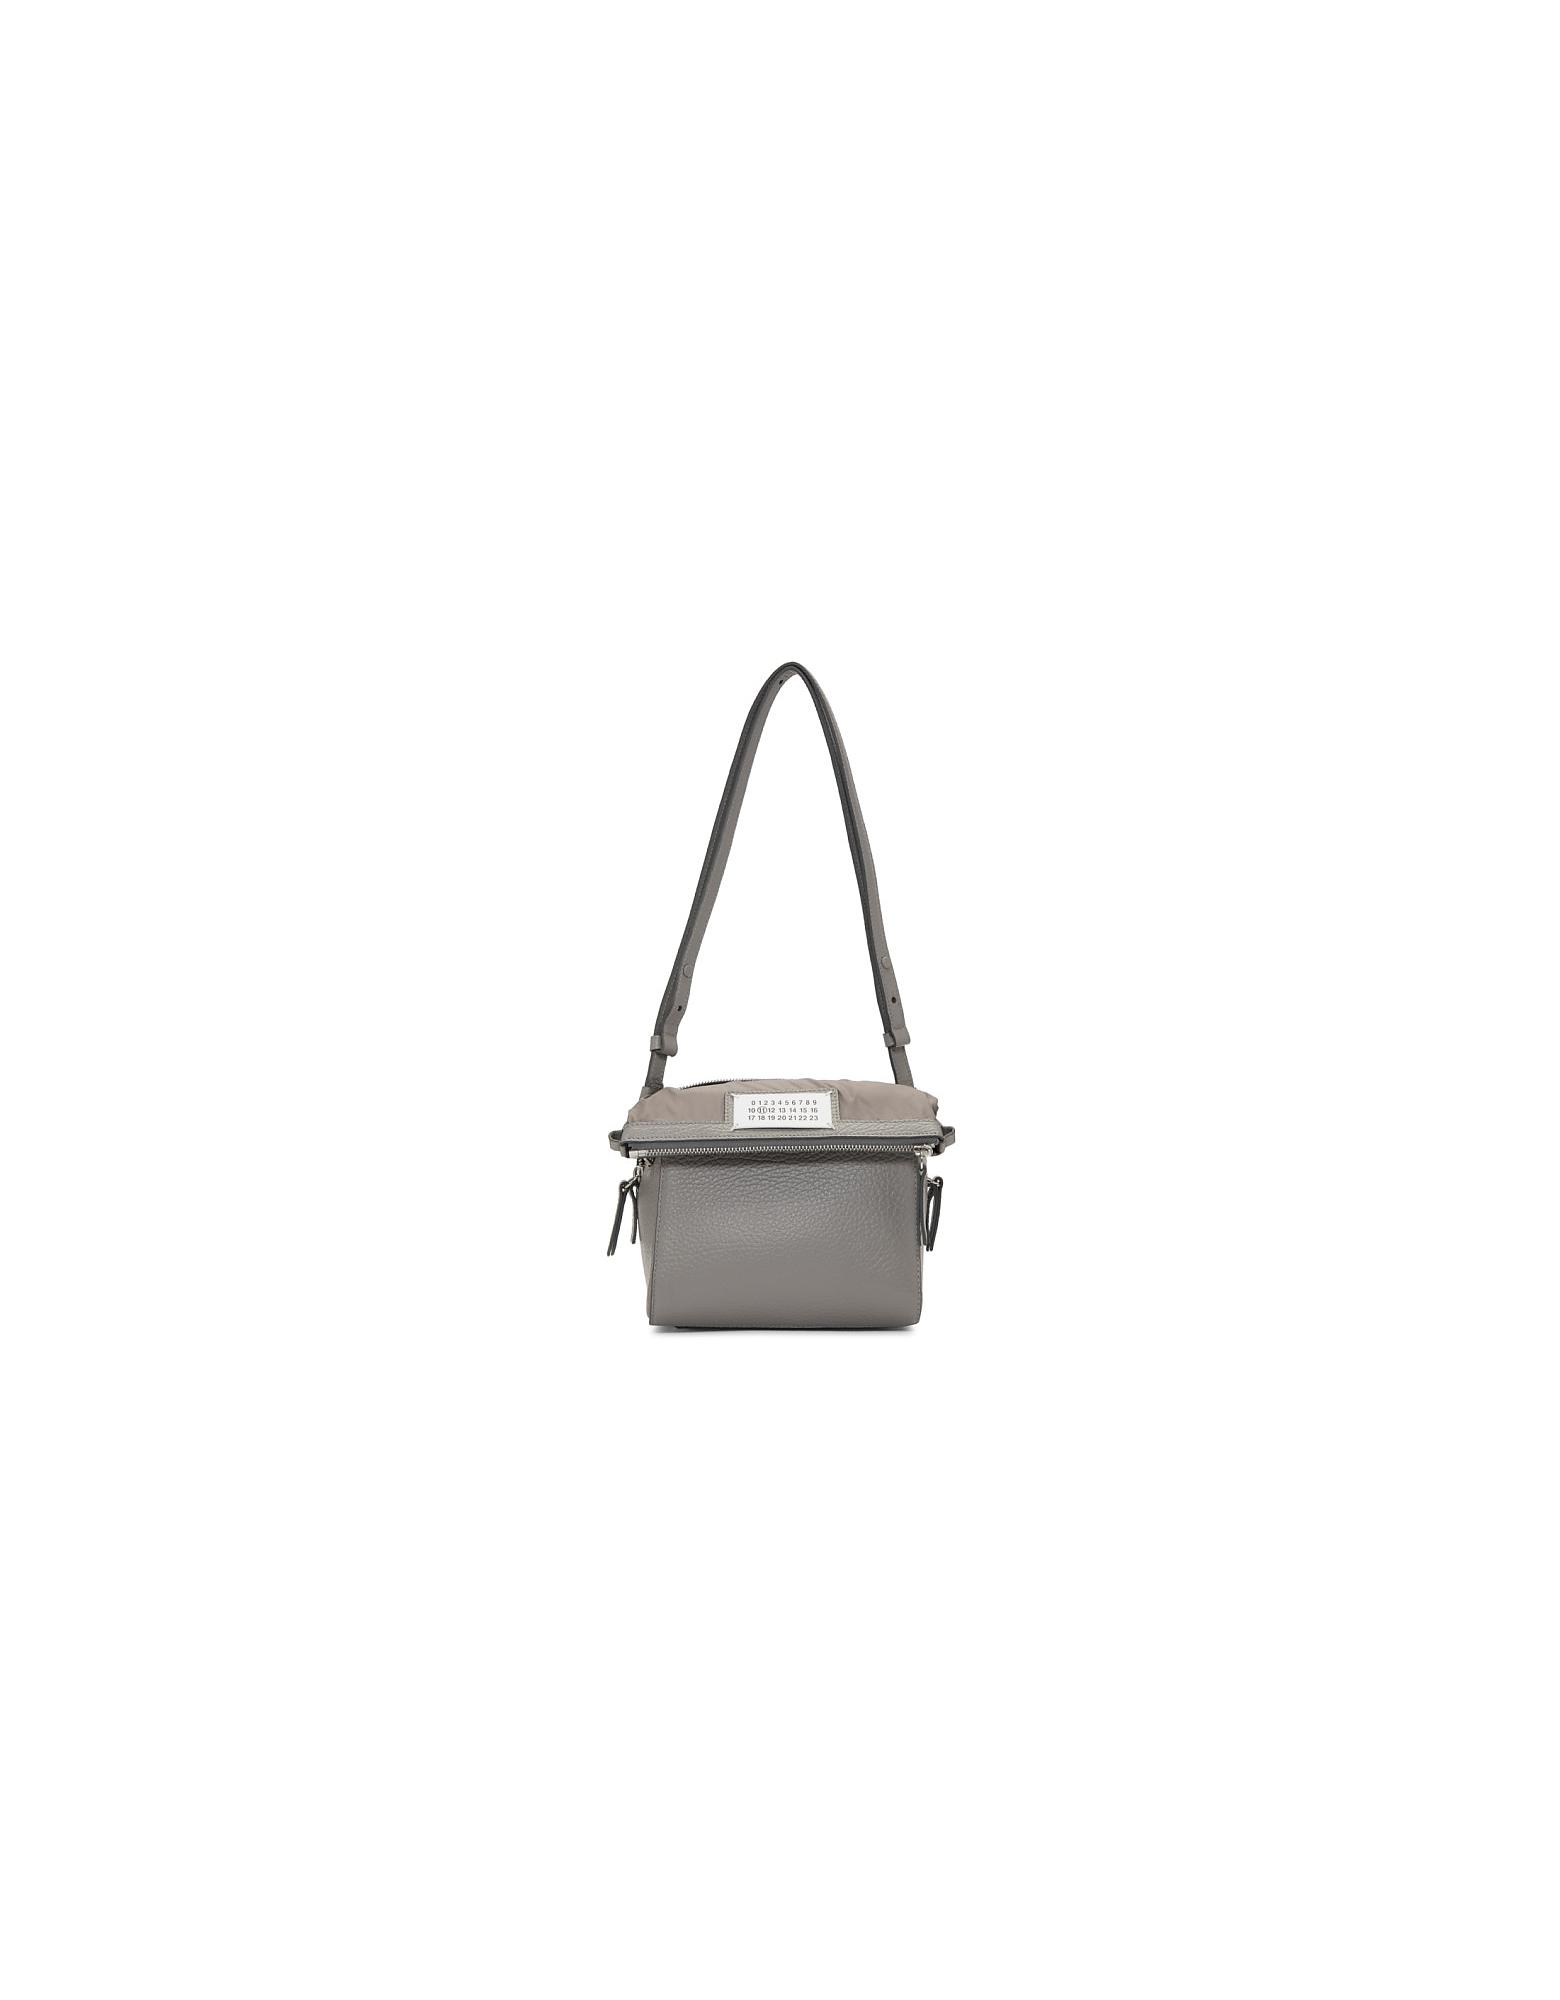 Maison Margiela Designer Handbags, Grey Medium 5AC Box Bag